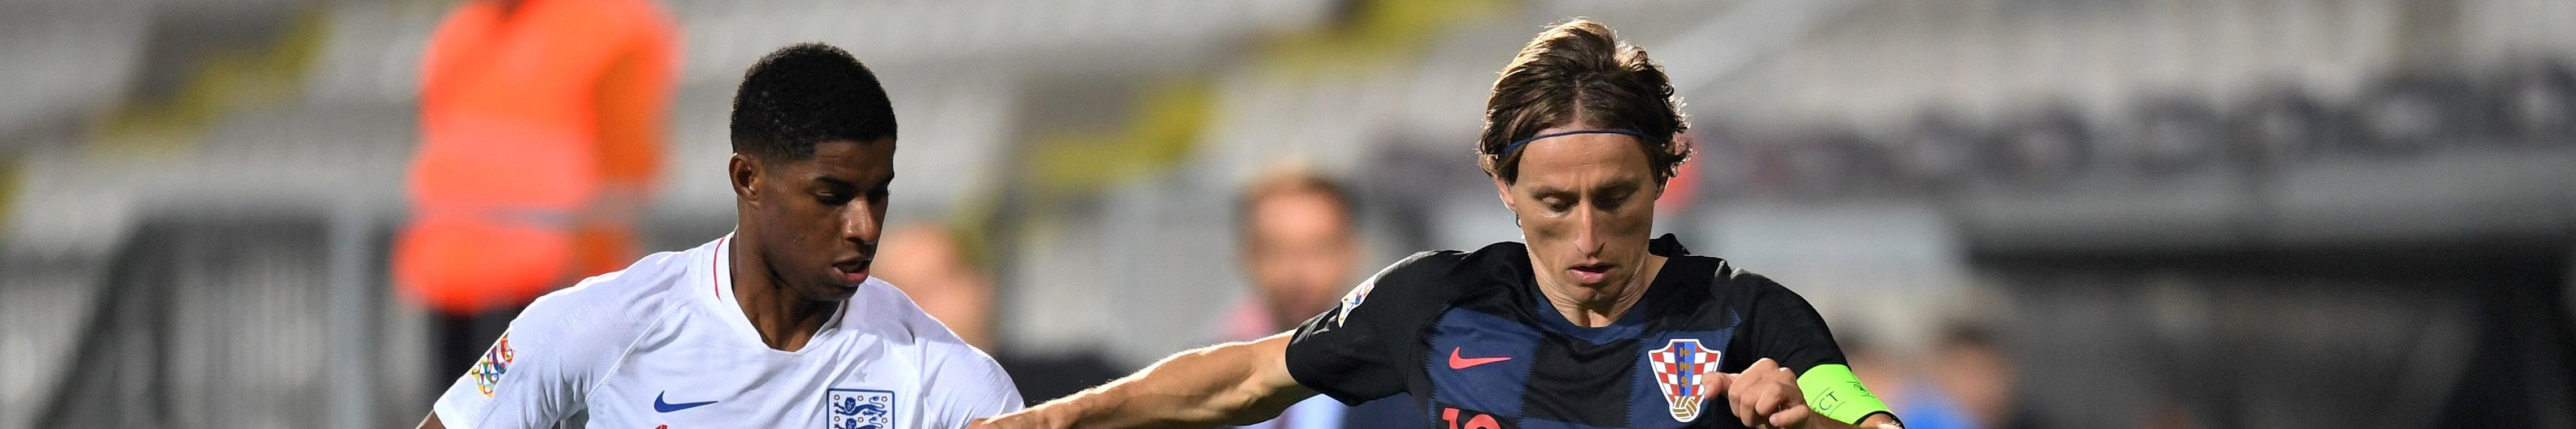 England - Kroatien: Kuriose Endspiel-Konstellation